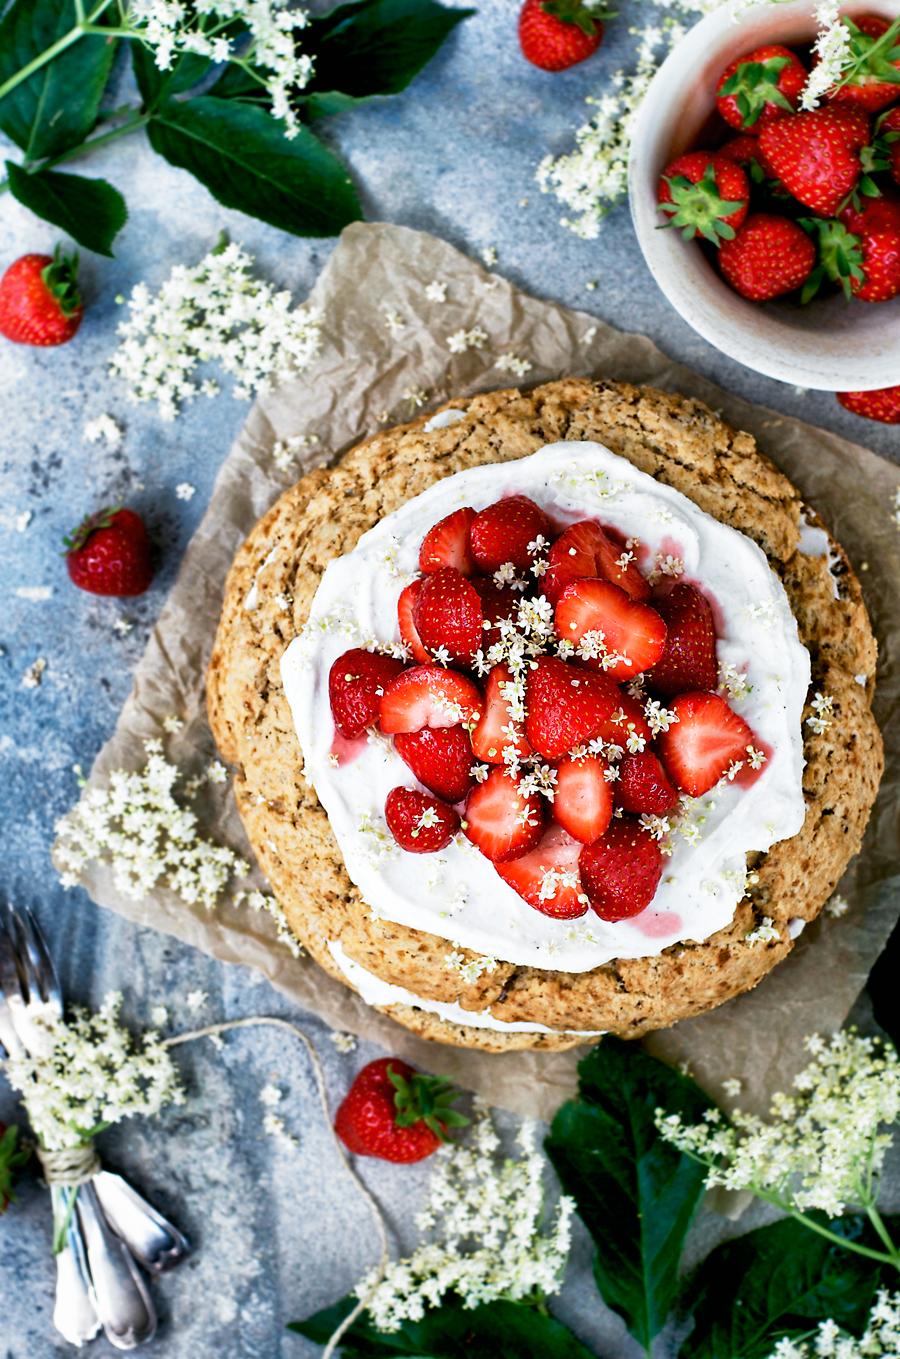 Strawberry Elderflower Scone Cake | occasionallyeggs.com